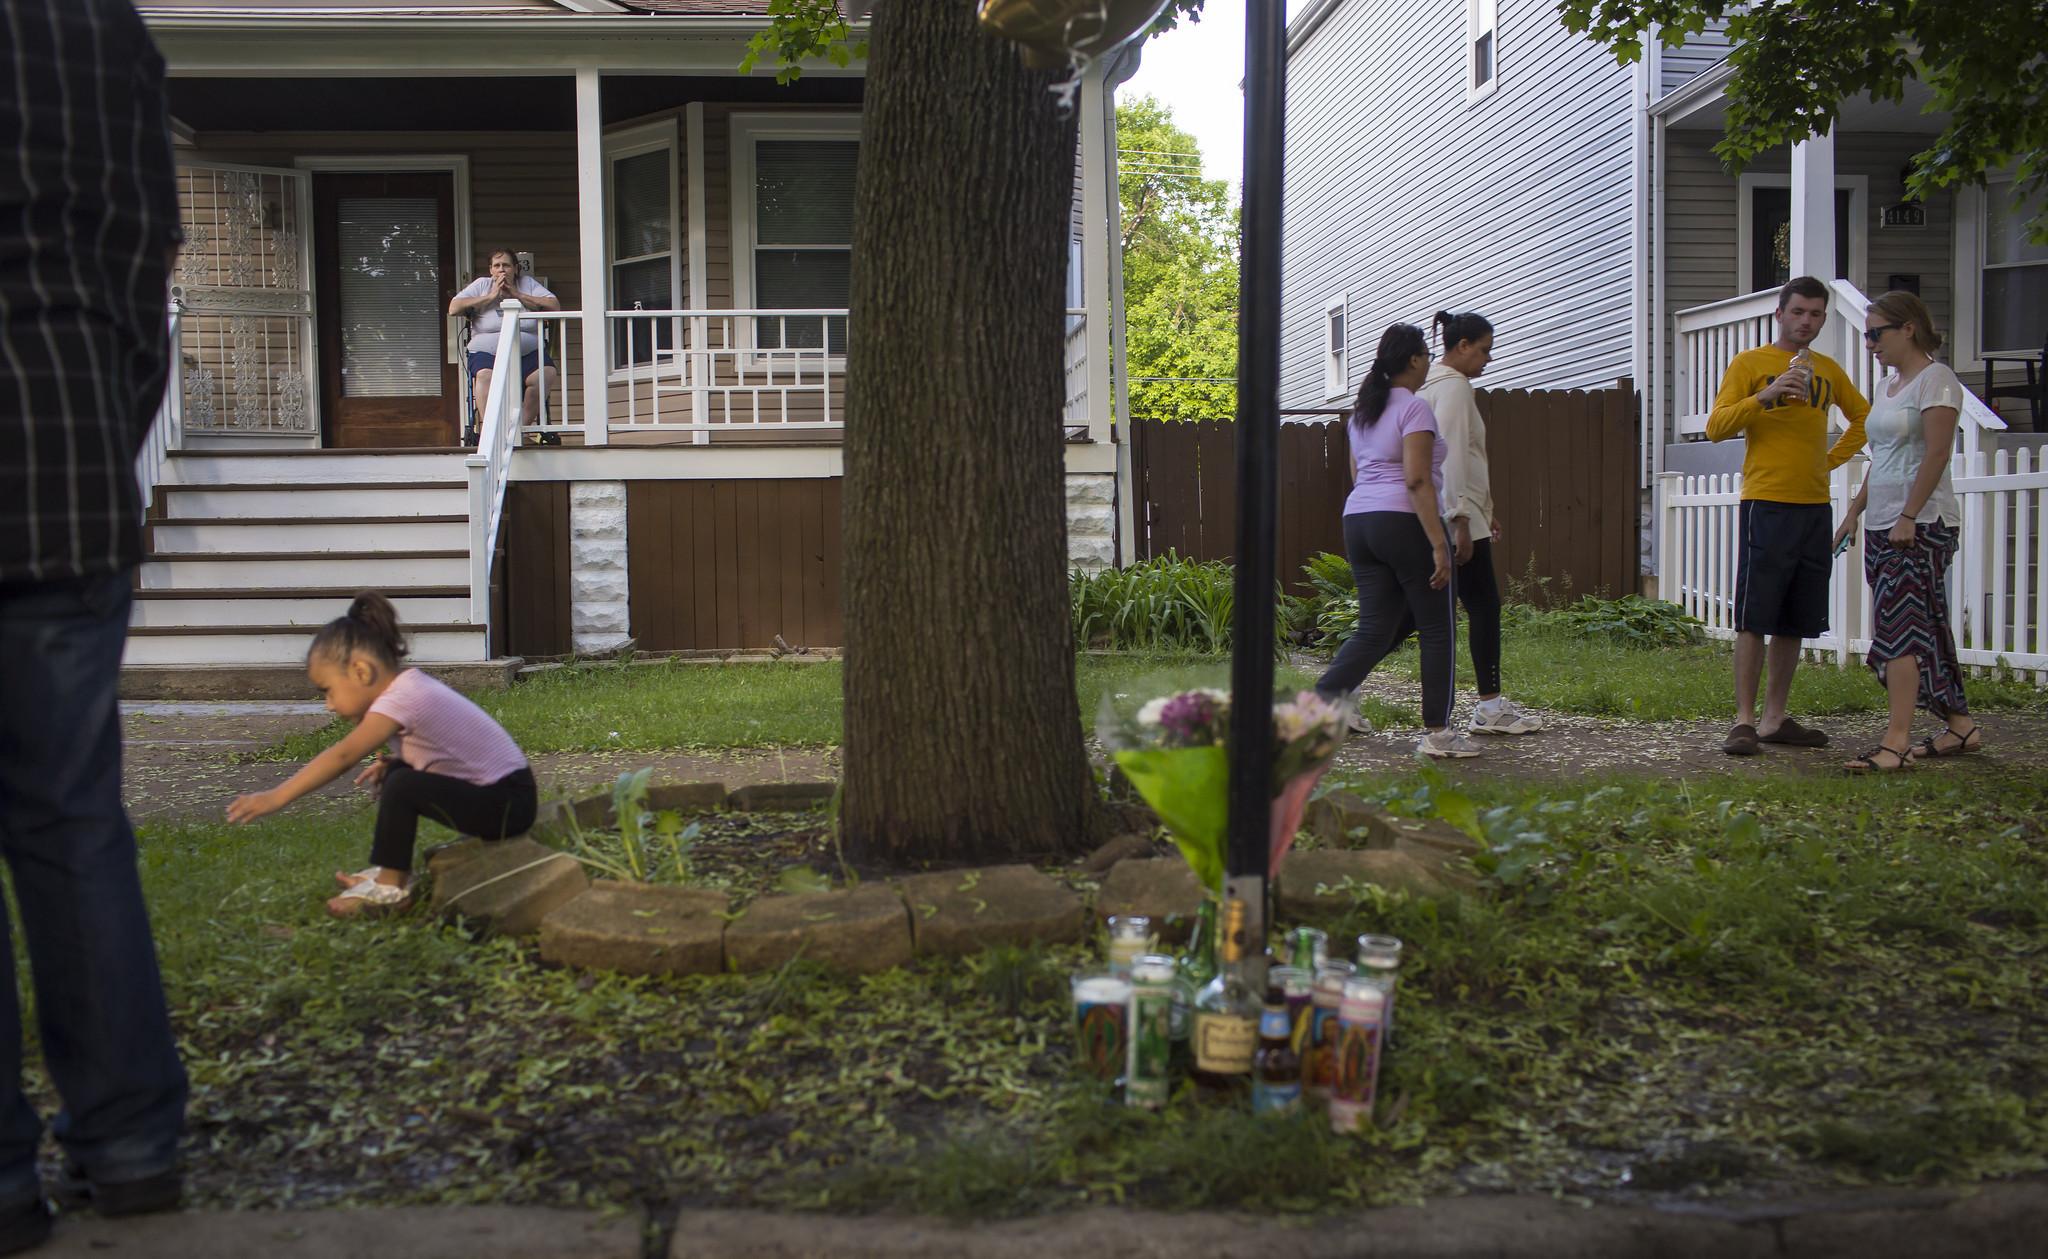 br>Living around gun violence - Chicago Tribune